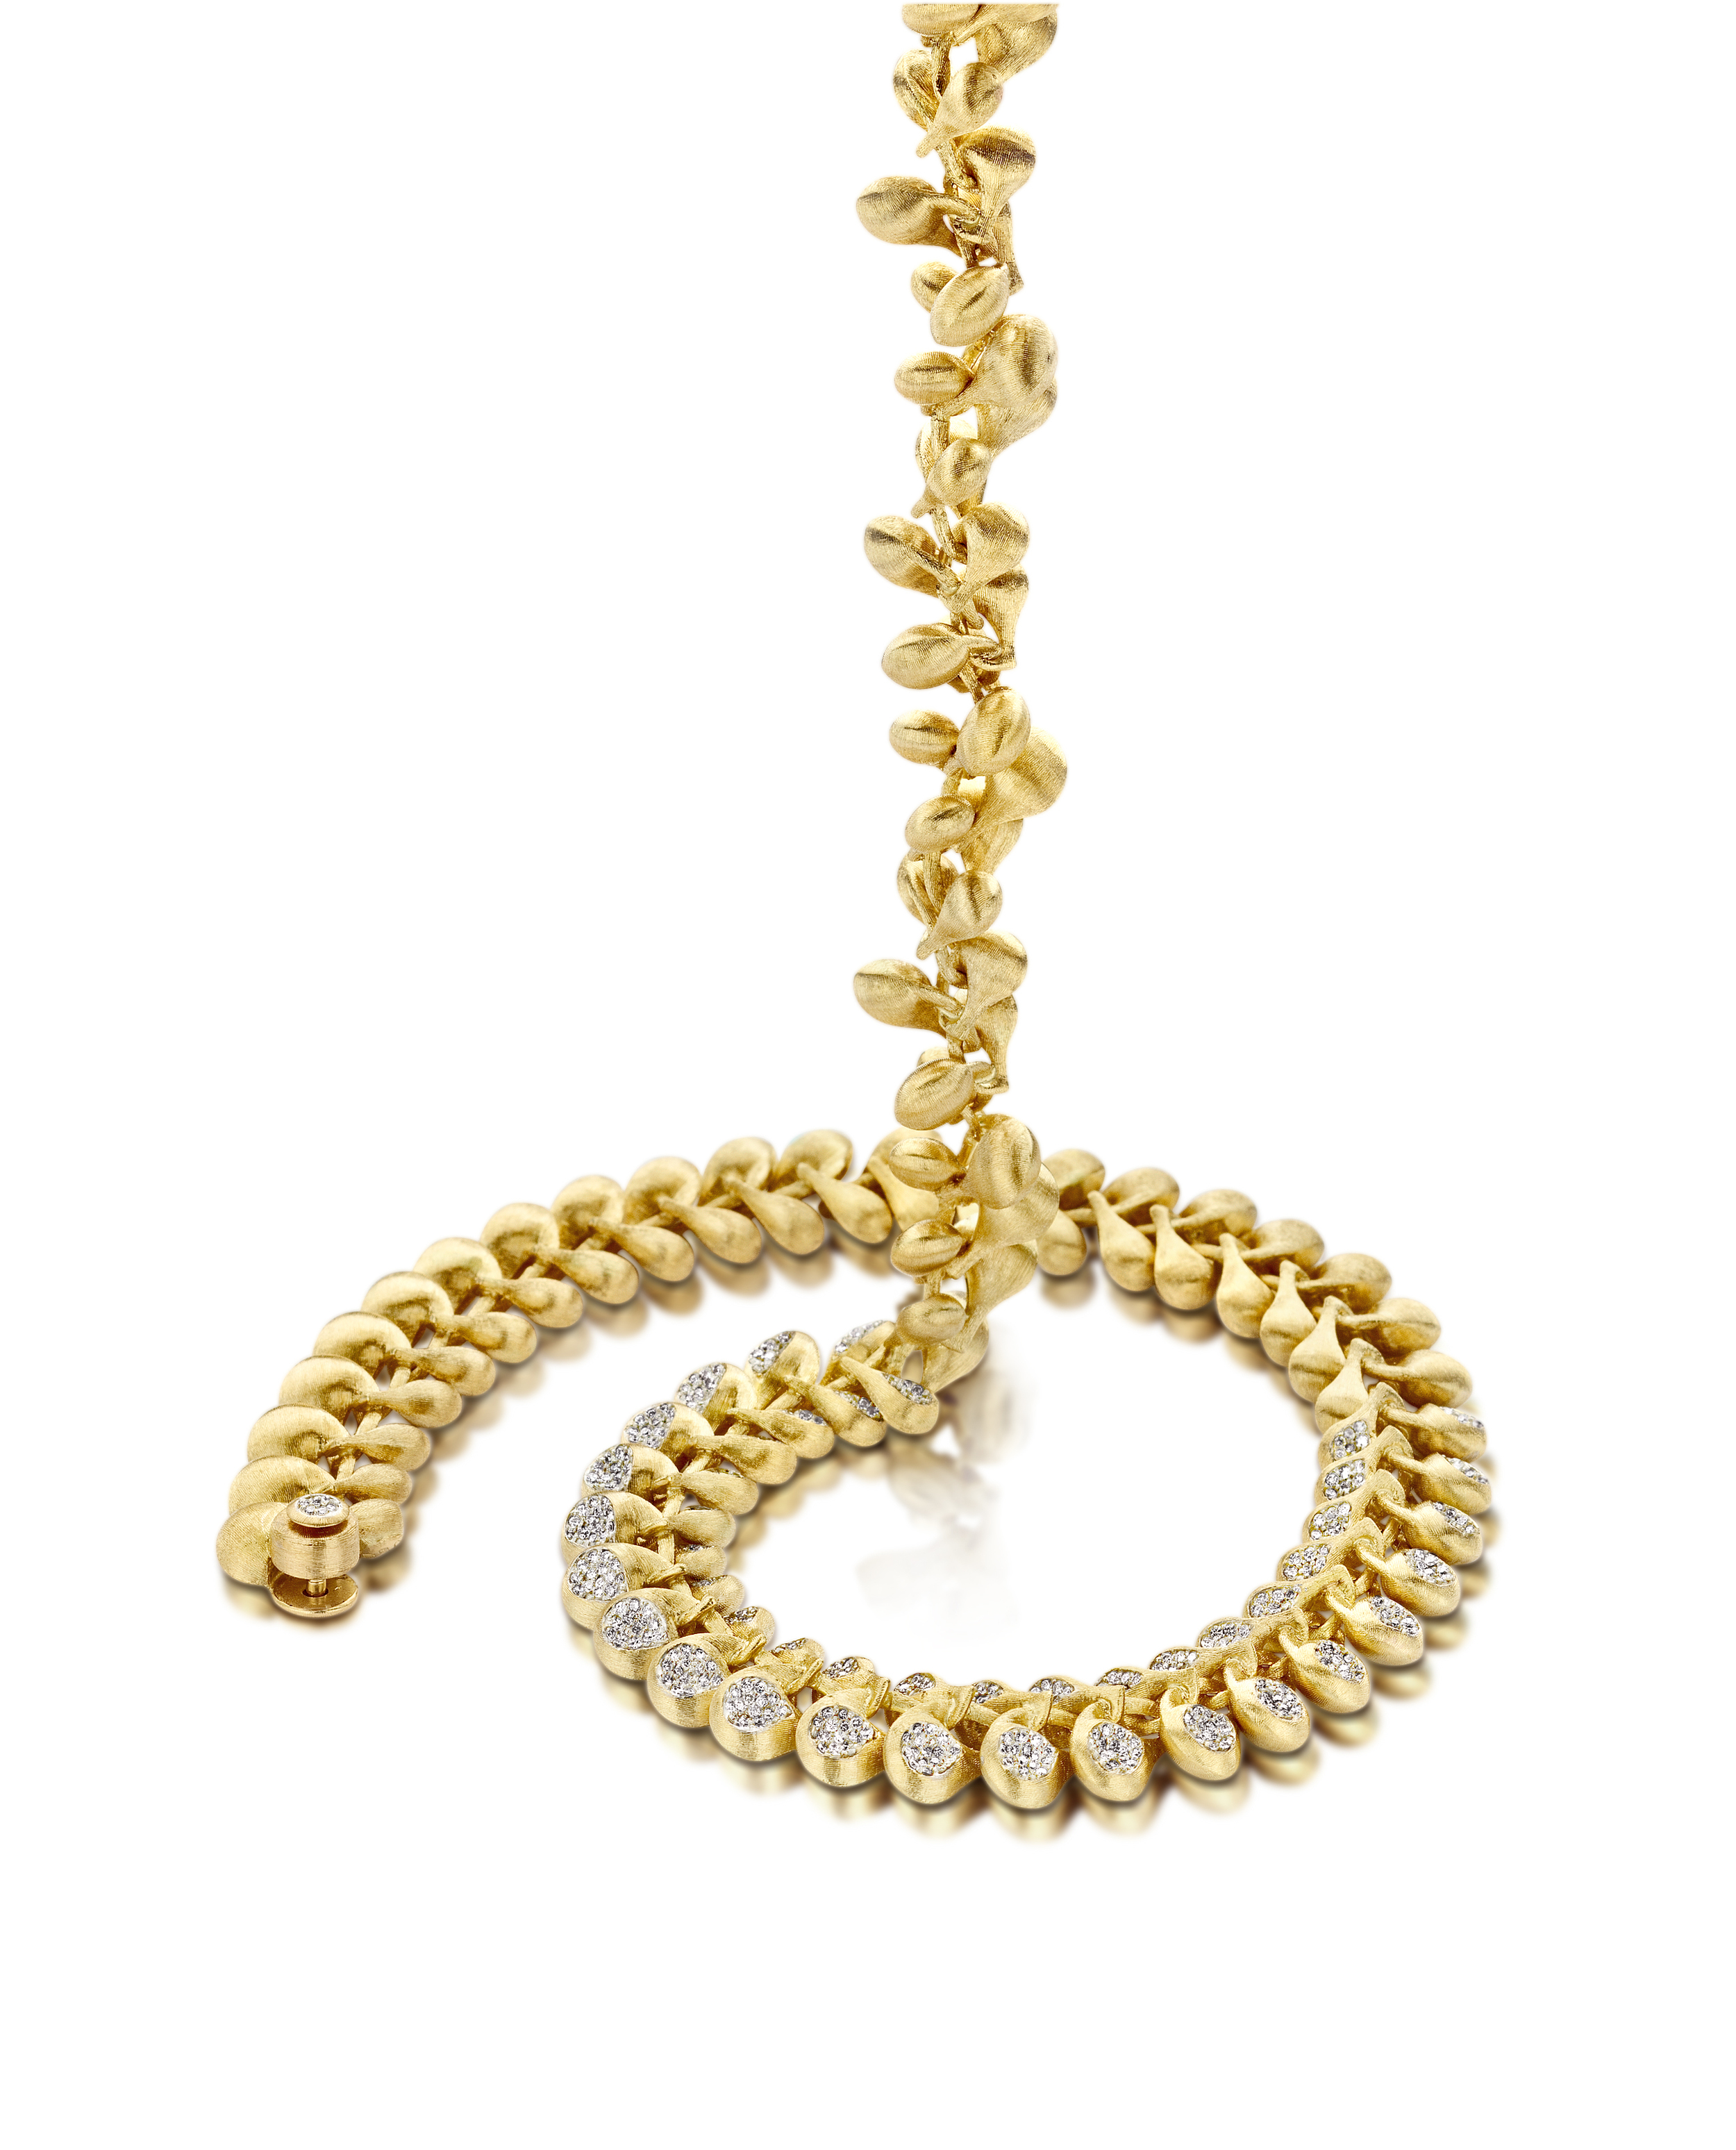 Nanis Necklace | Ventura Jewelers | Van Gundys